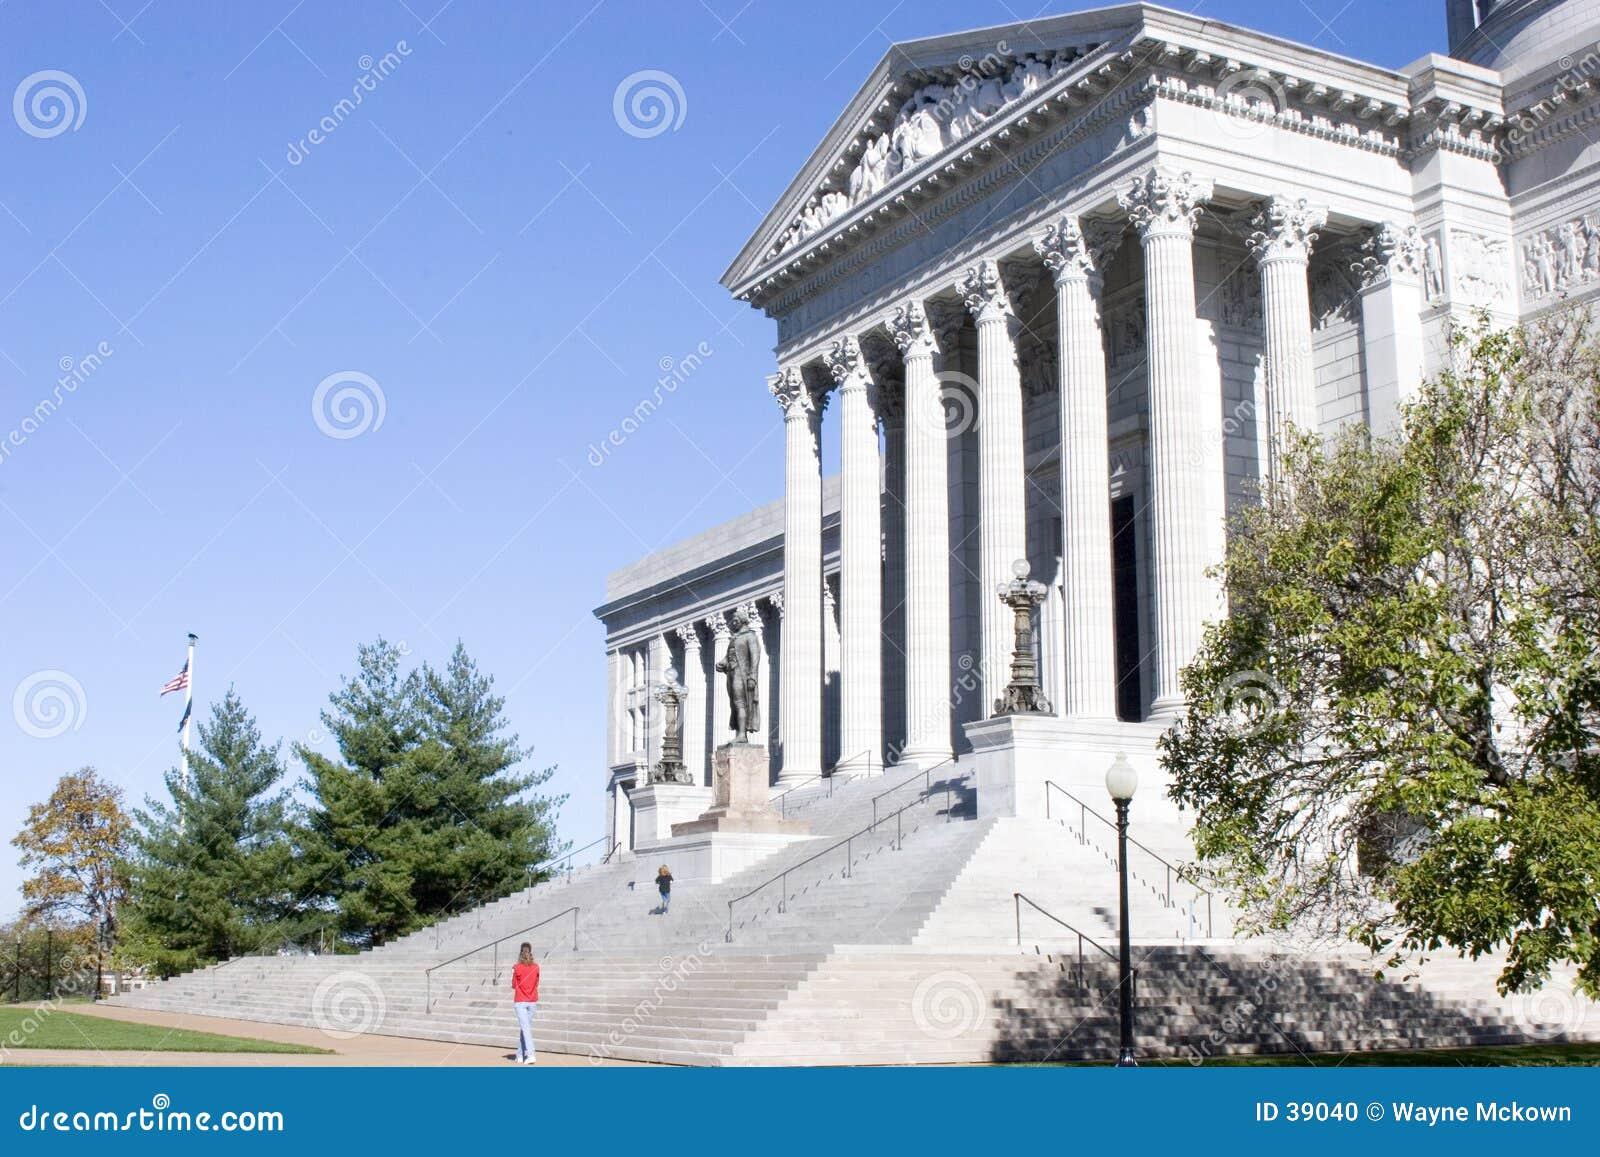 Sightseers no Capitólio do estado de Missouri